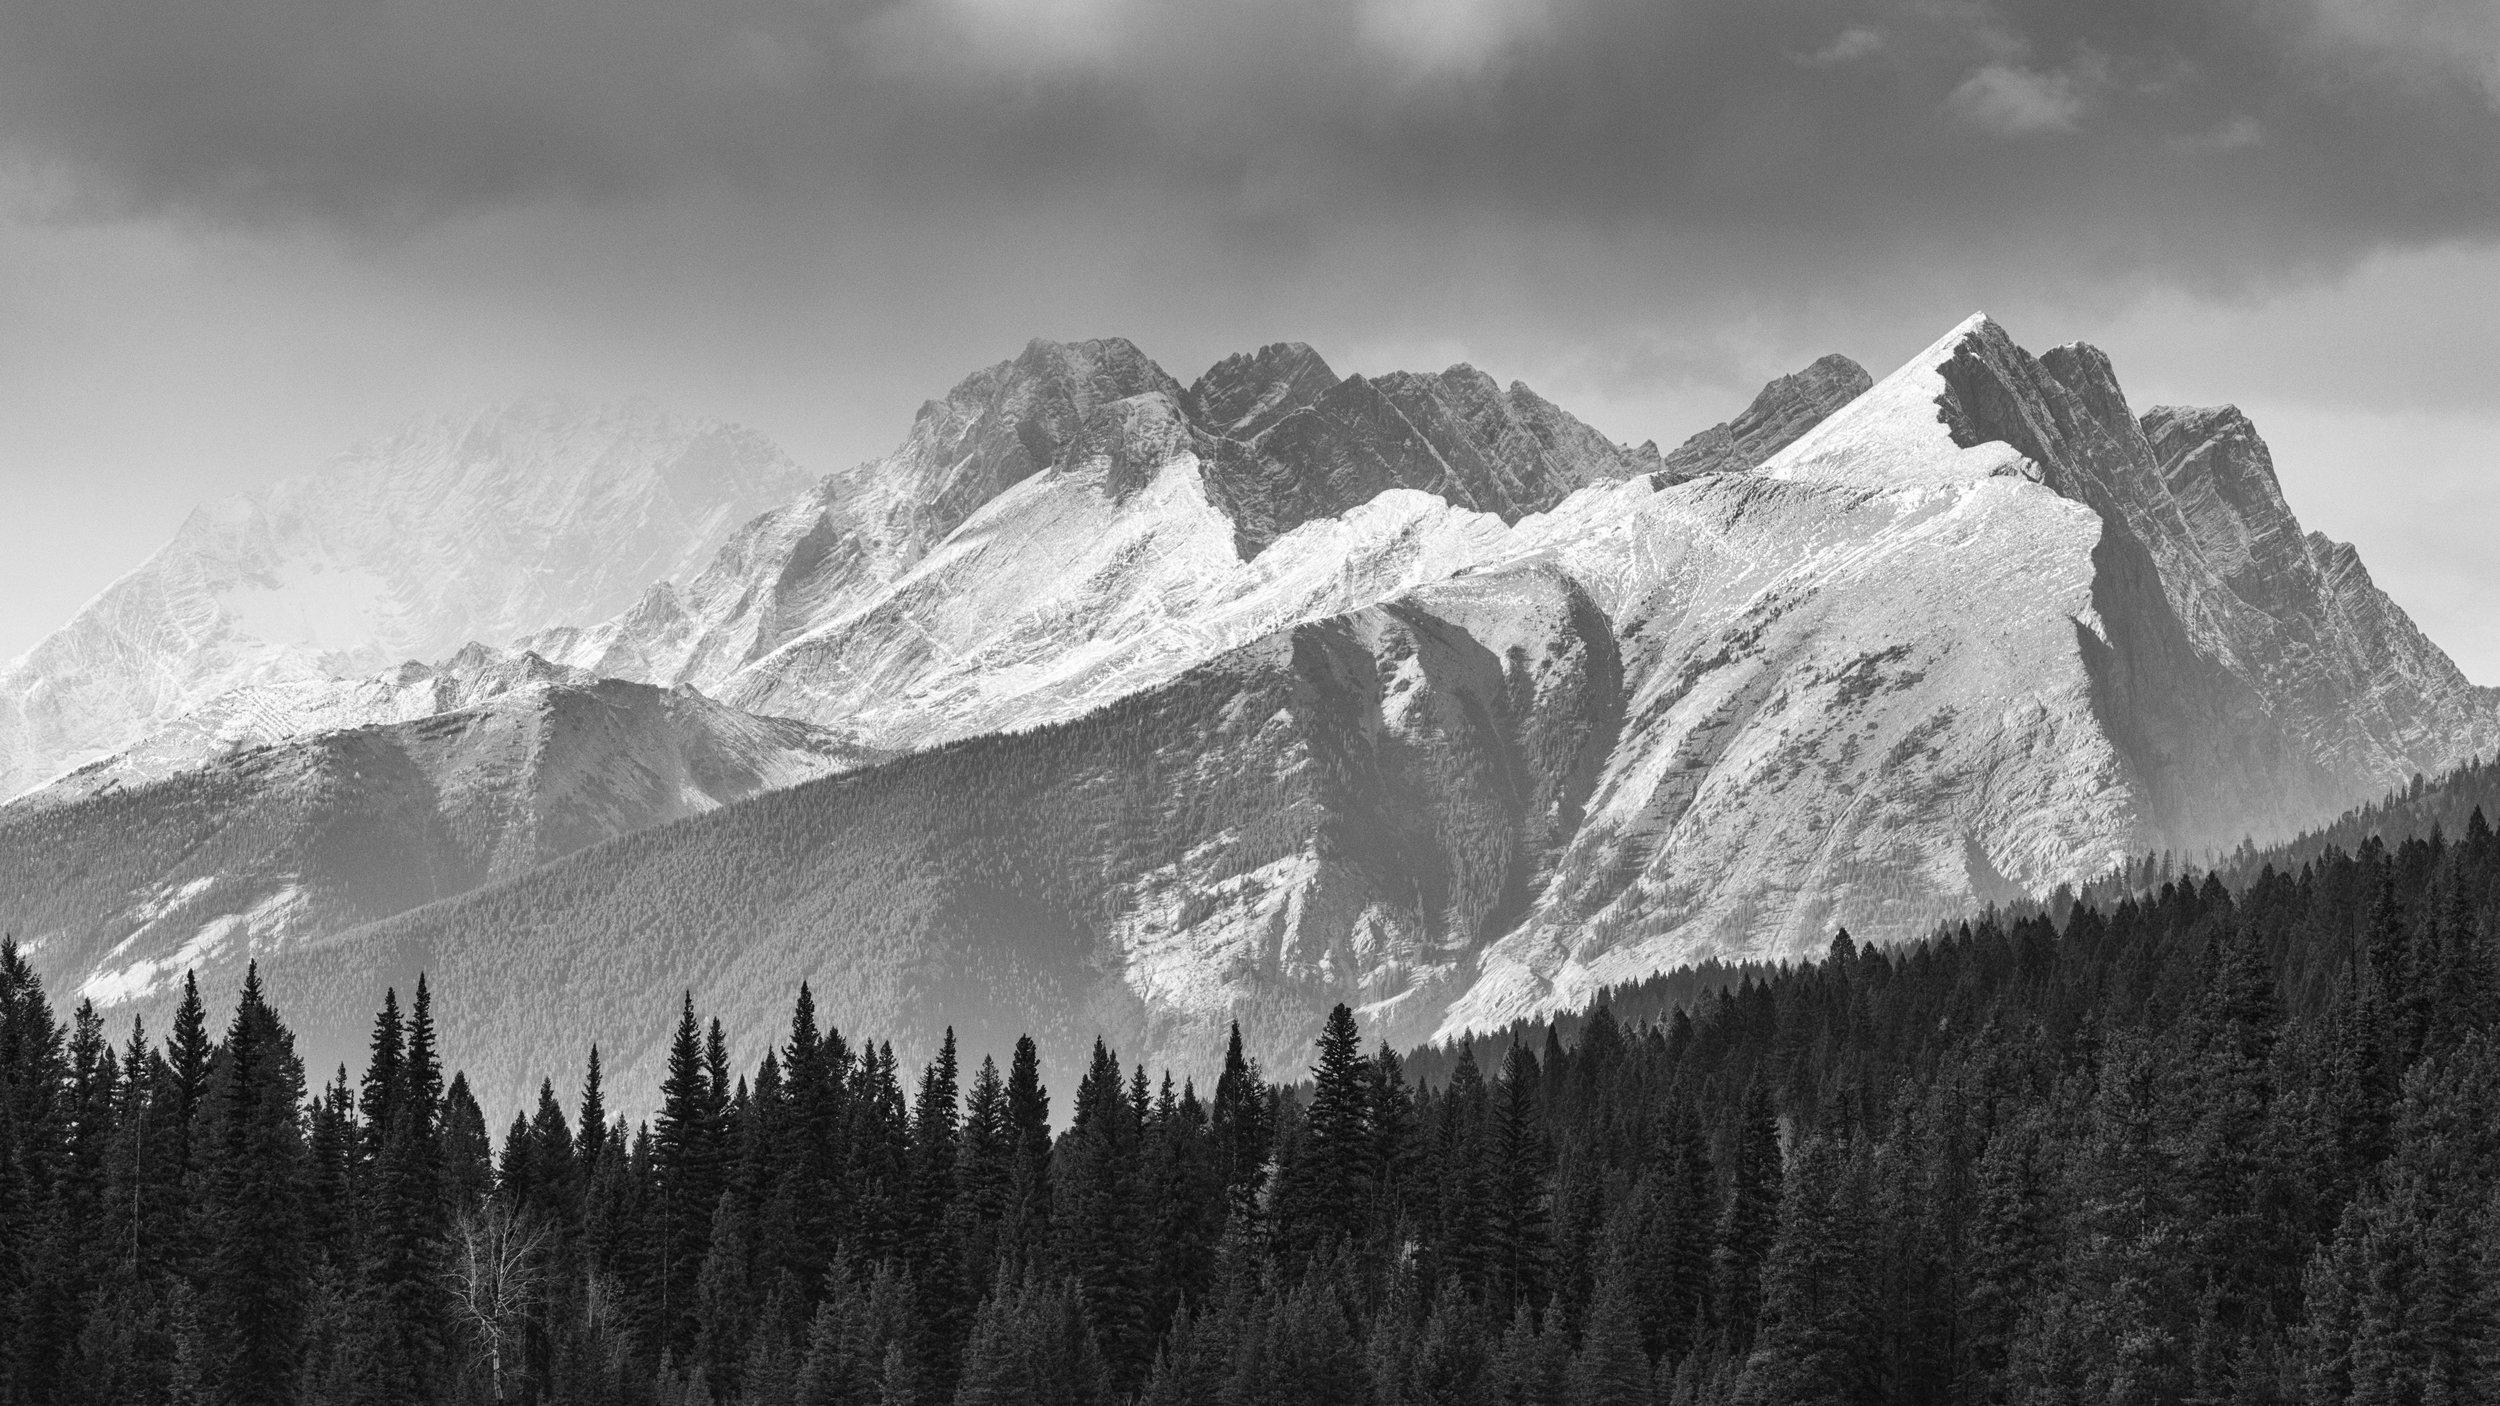 Kootenay National Park, British Columbia